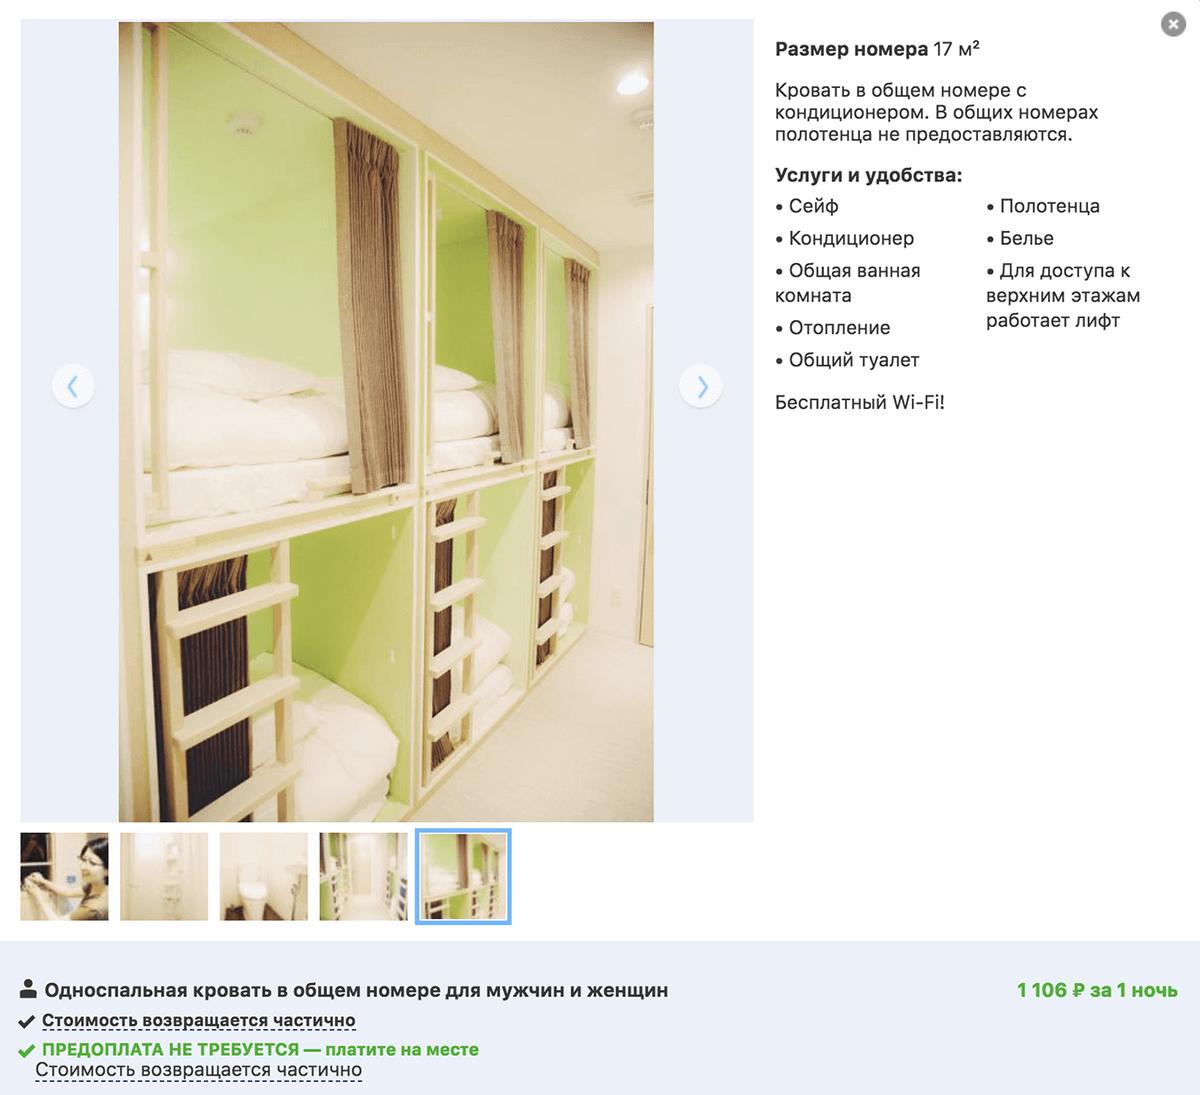 Кровать в хостеле Bunka Hostel — от 1100<span class=ruble>Р</span> за ночь